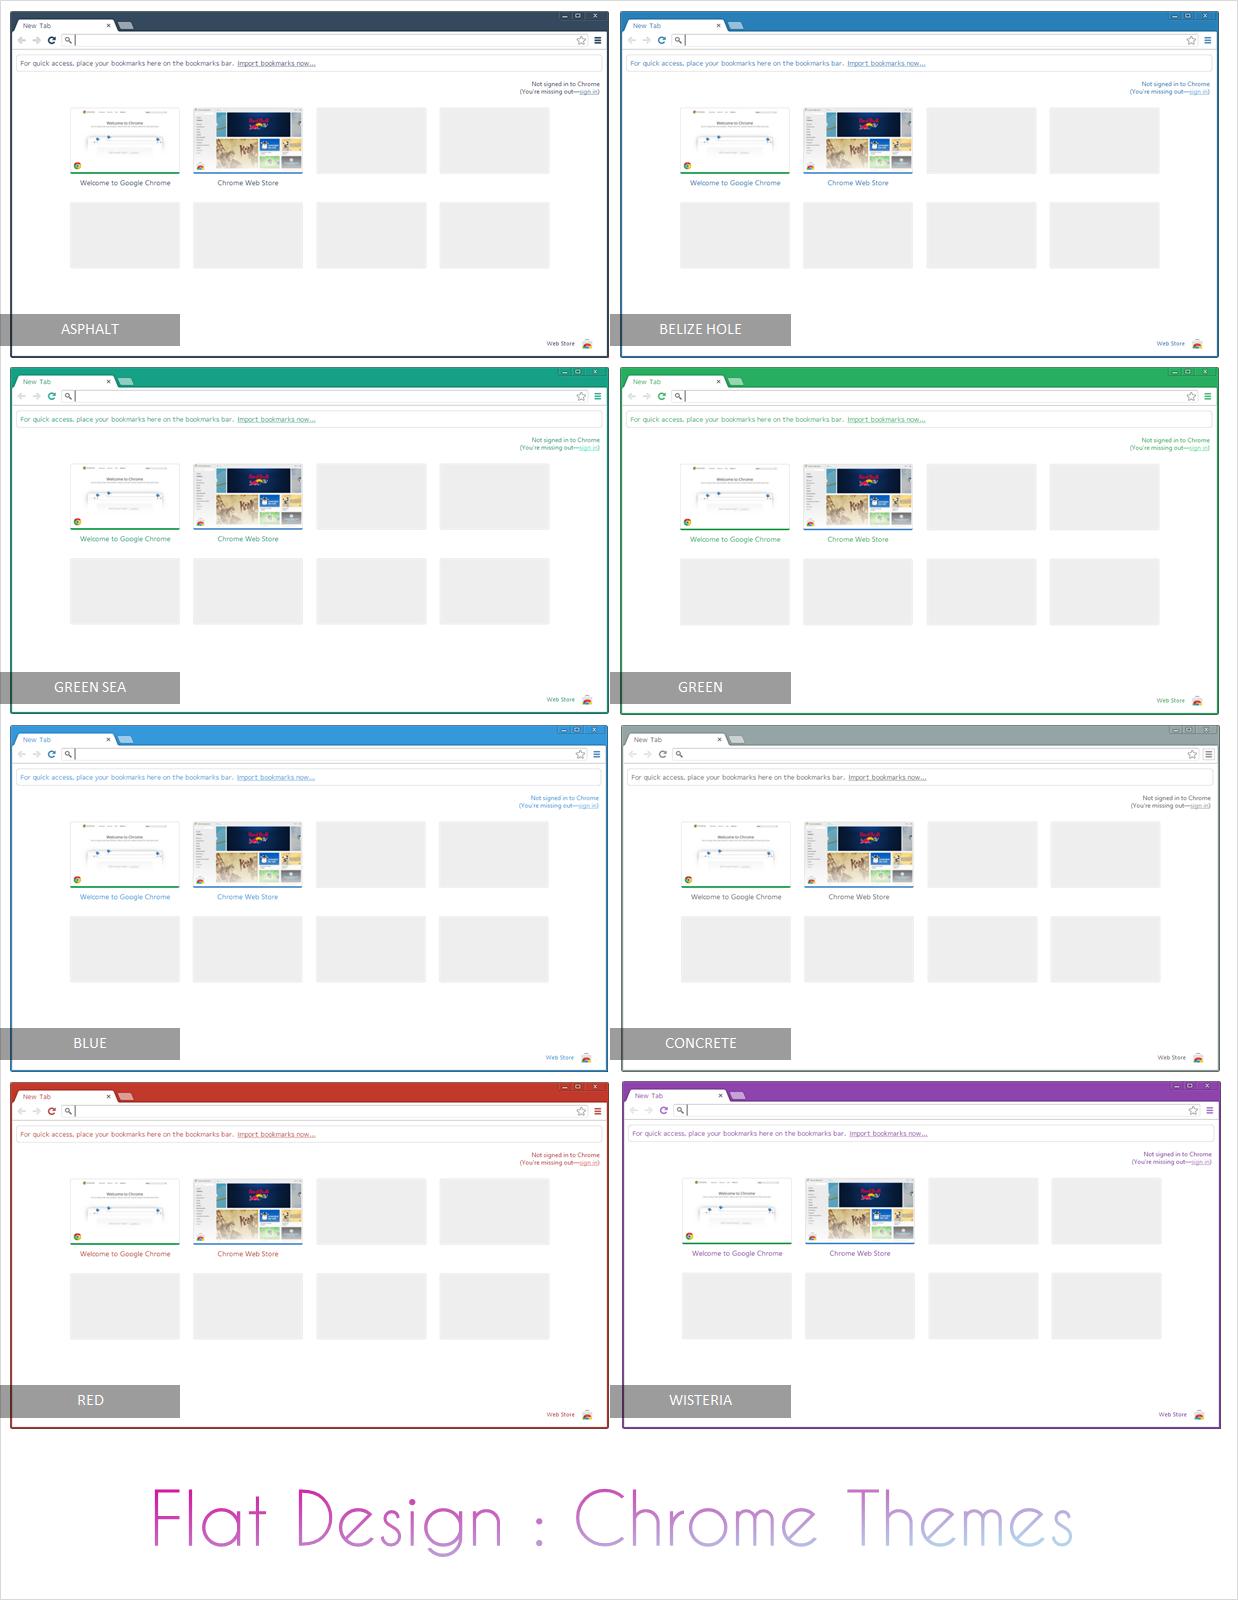 Flat Design Google Chrome Themes By F79h On DeviantArt